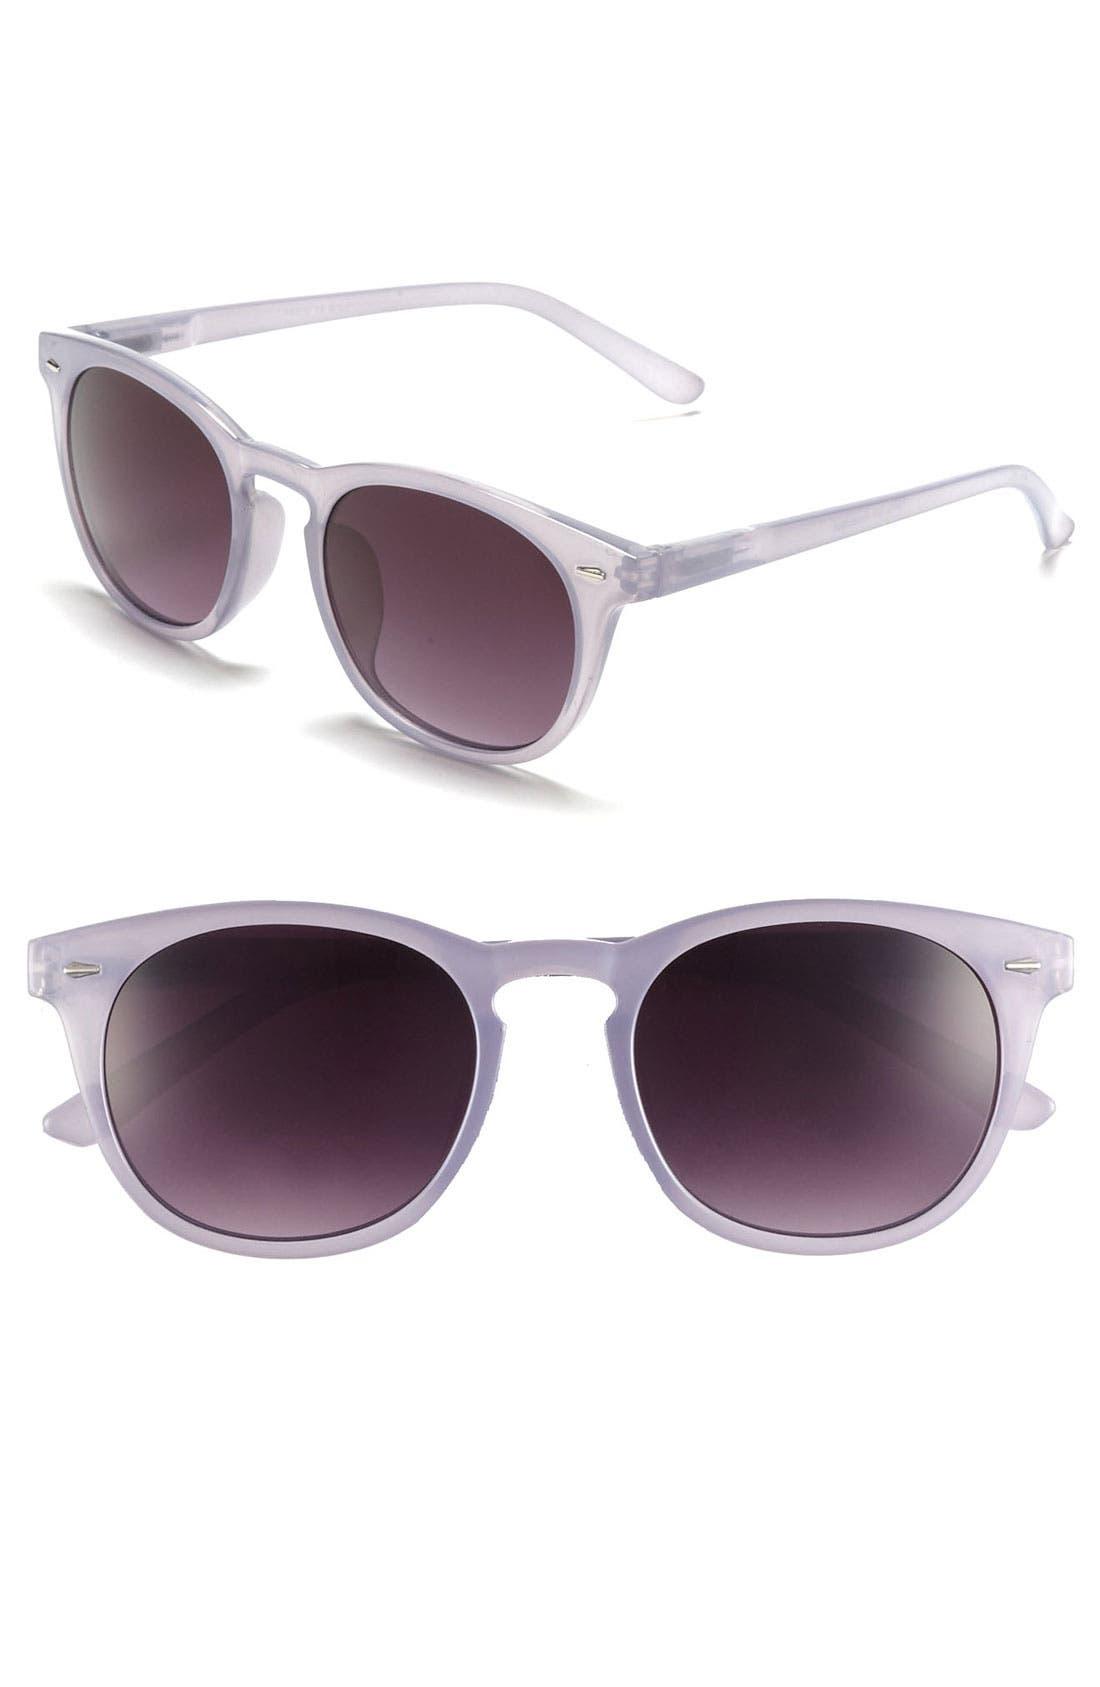 Main Image - FE NY 'Princeton' Sunglasses